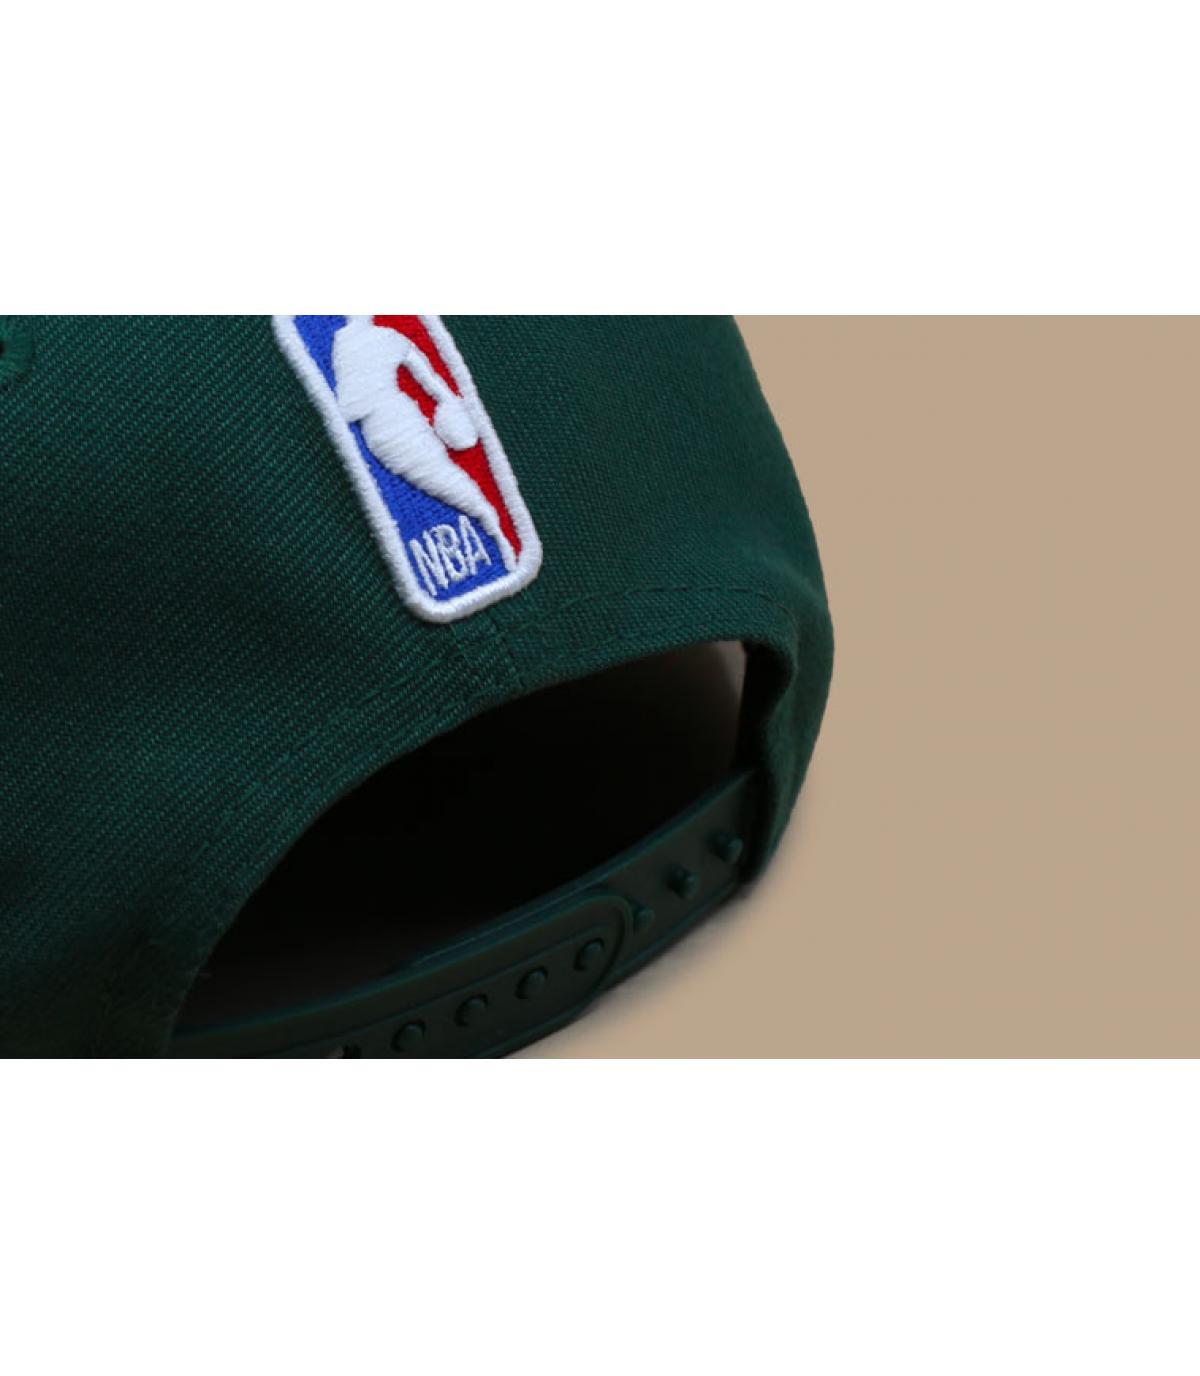 Details Snapback NBA Draft Bucks  950 - Abbildung 5